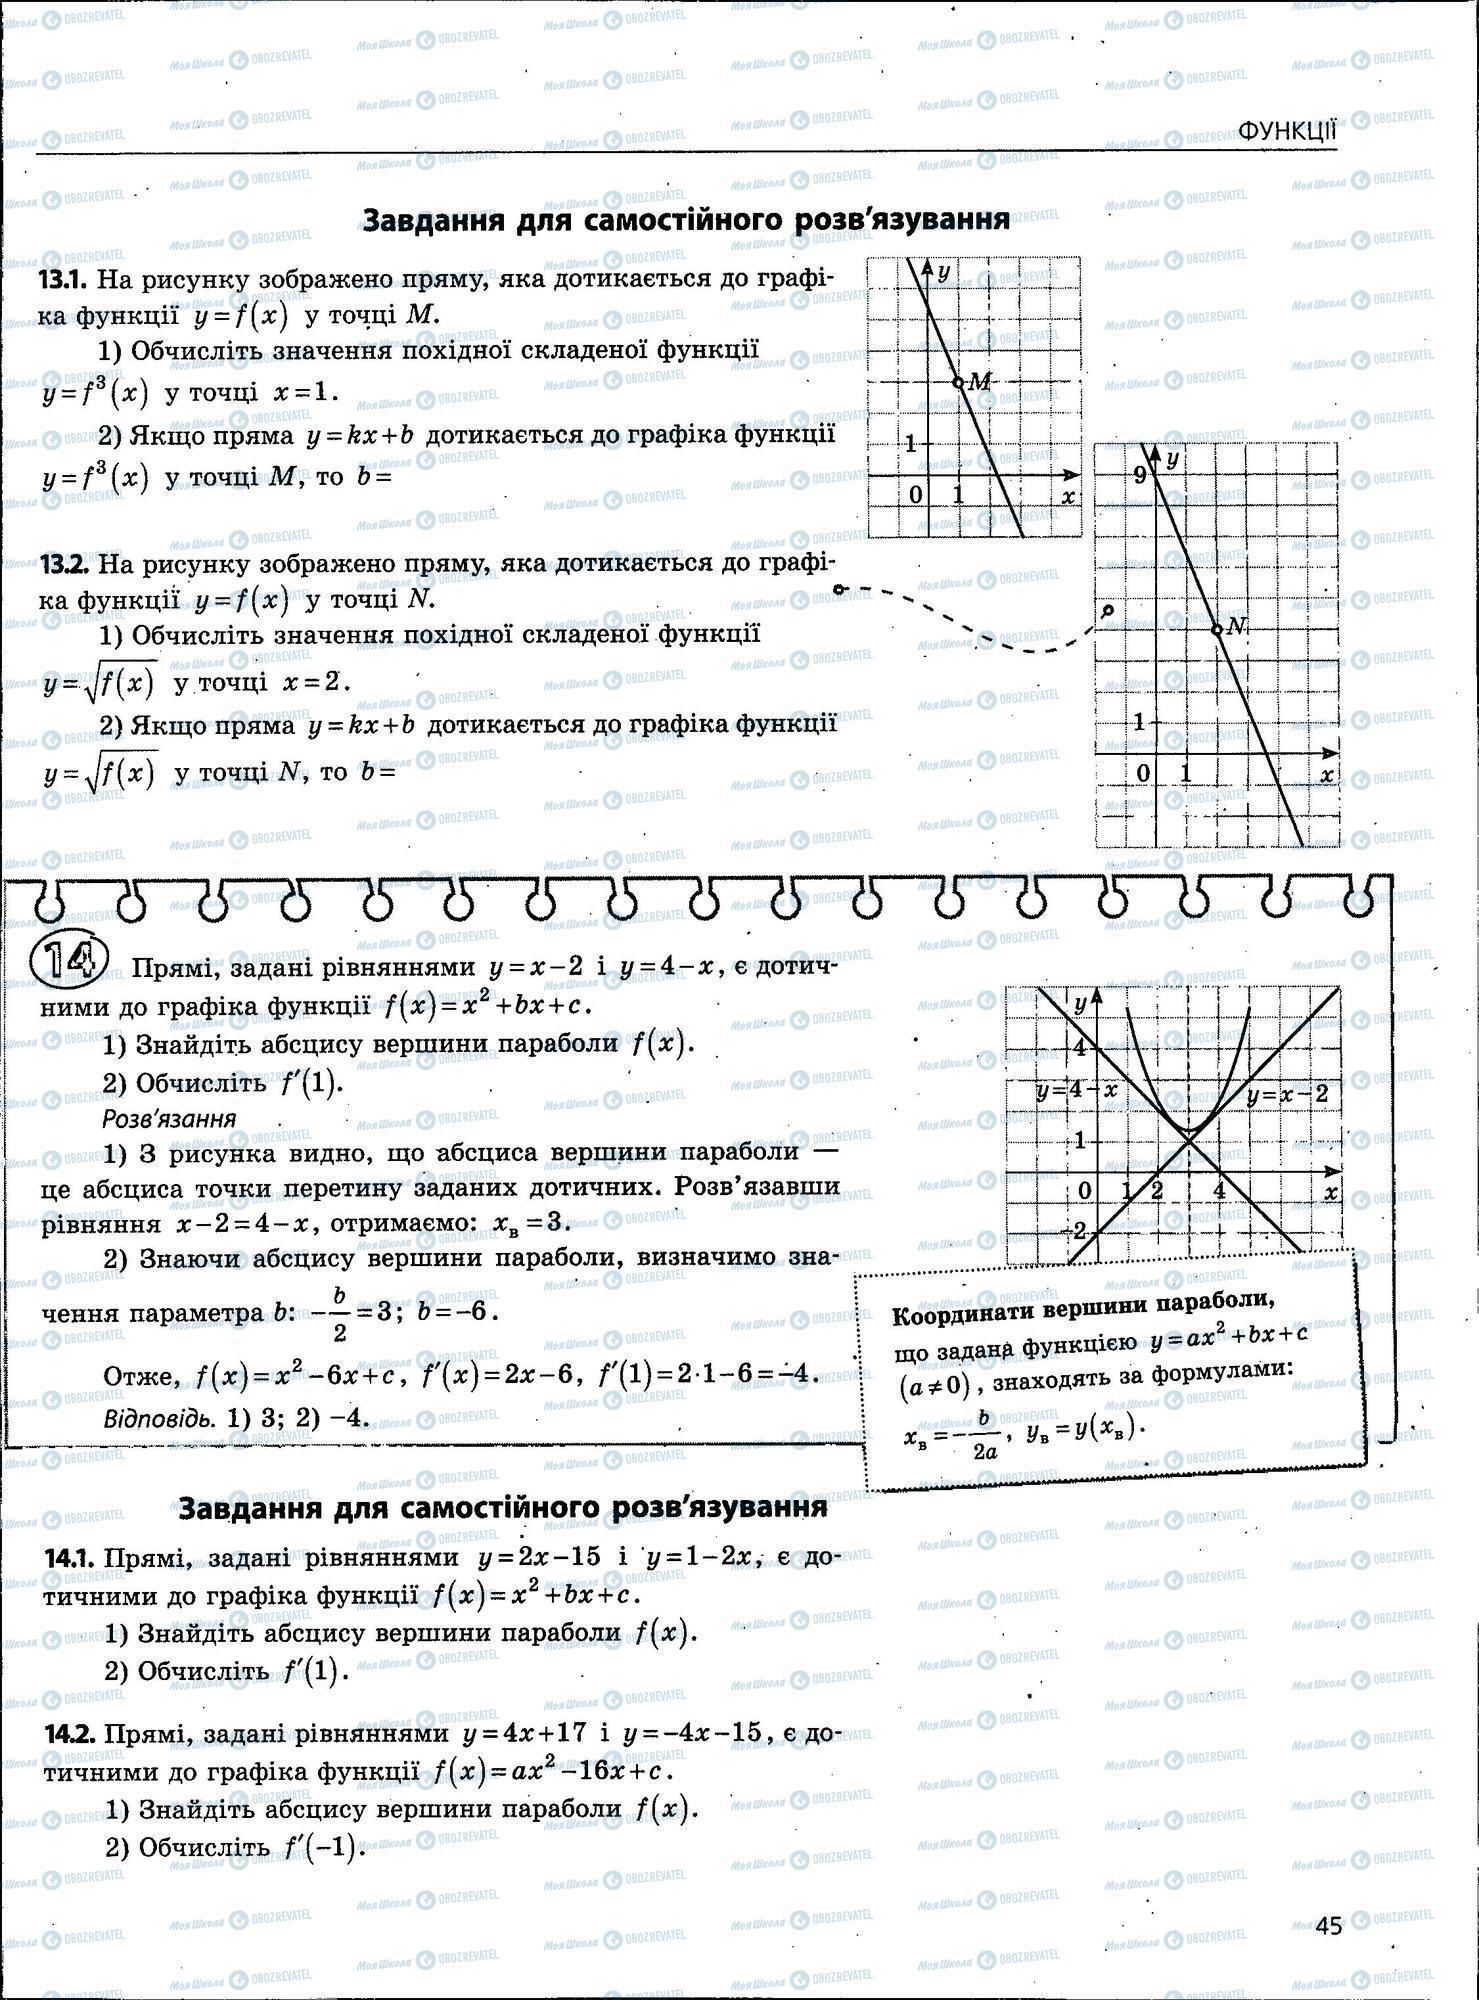 ЗНО Математика 11 класс страница 45